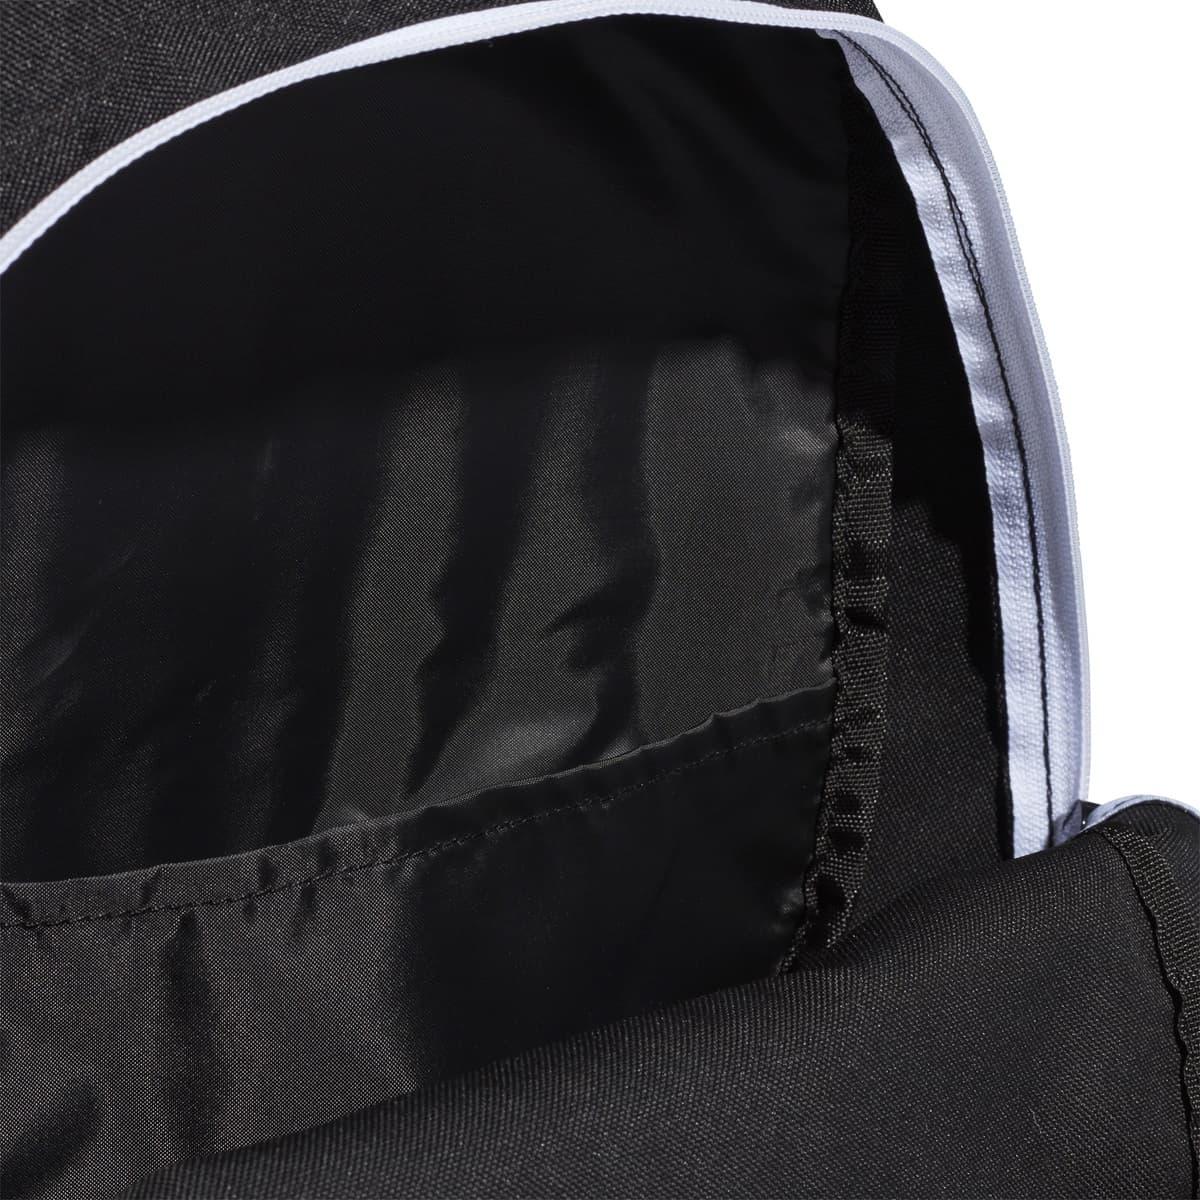 Classic 3 Bantlı Siyah Sırt Çantası